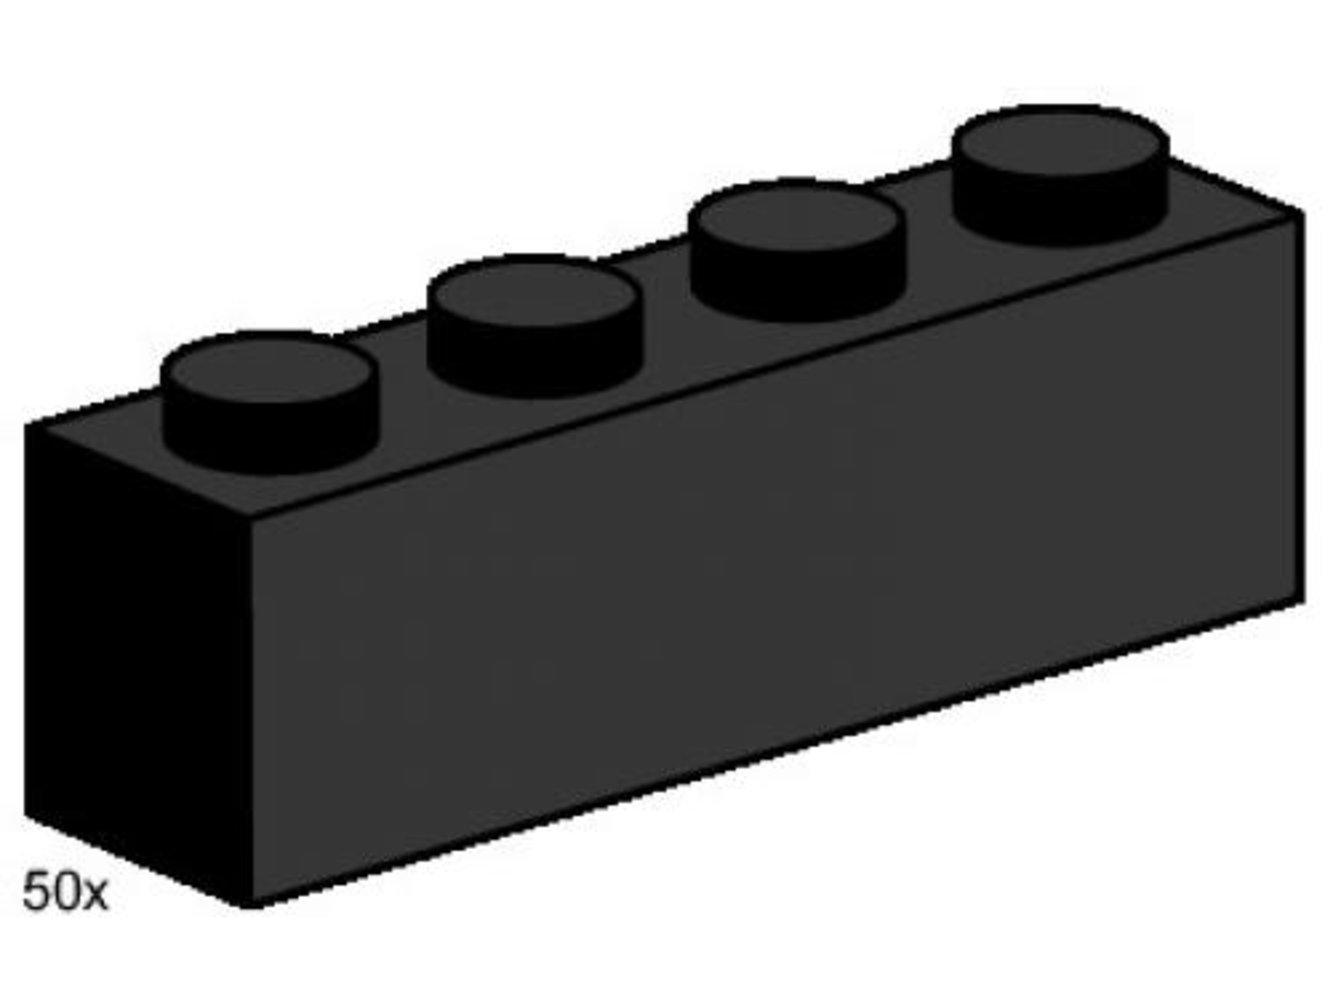 1 x 4 Black Bricks